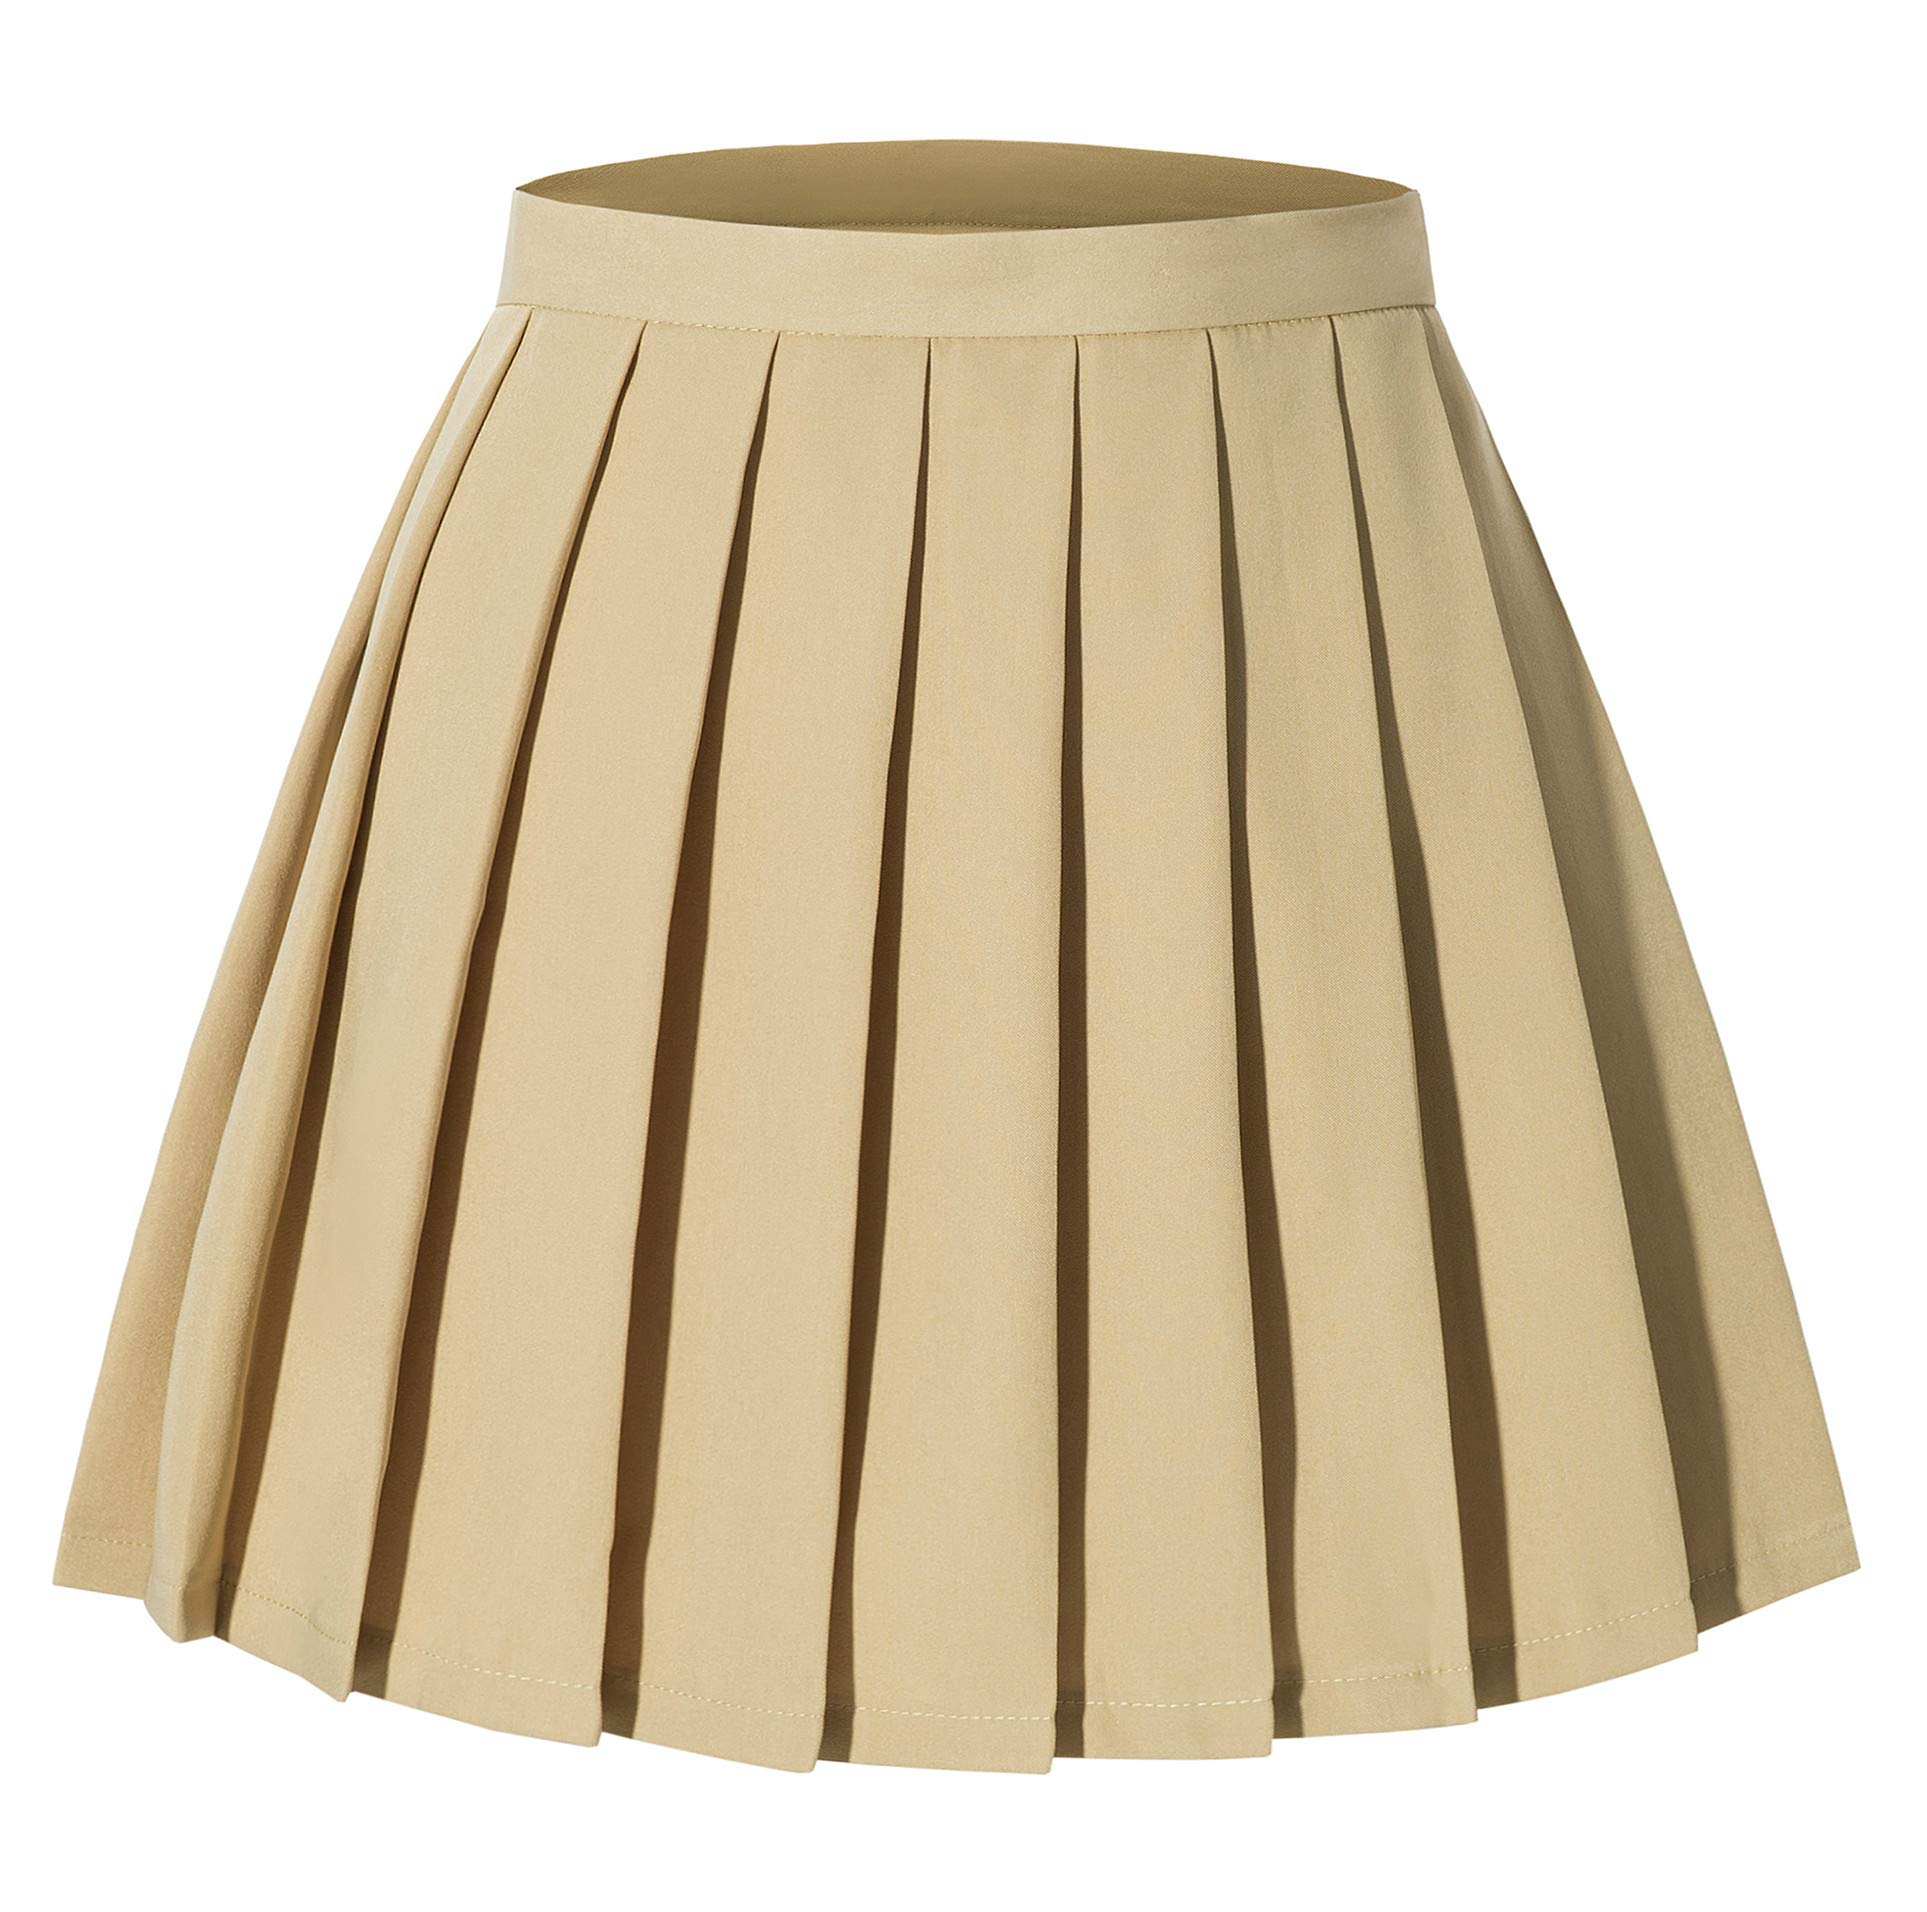 Girl's A-line Kilt Plaid Pleated Skirts Show Skirt(M,Khaki)